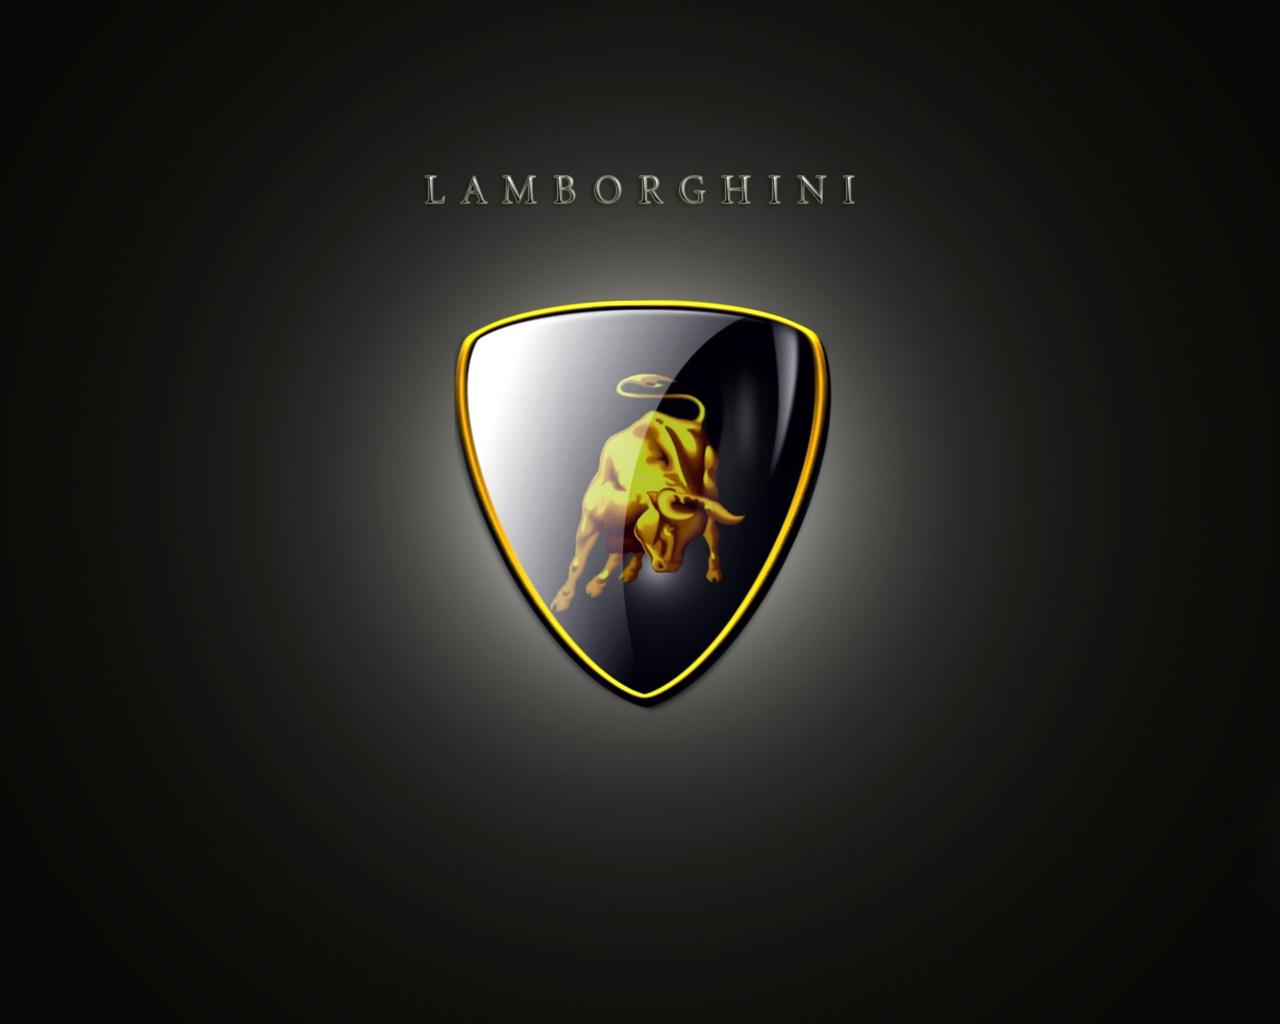 lamborghini logo wallpaper9 - photo #6